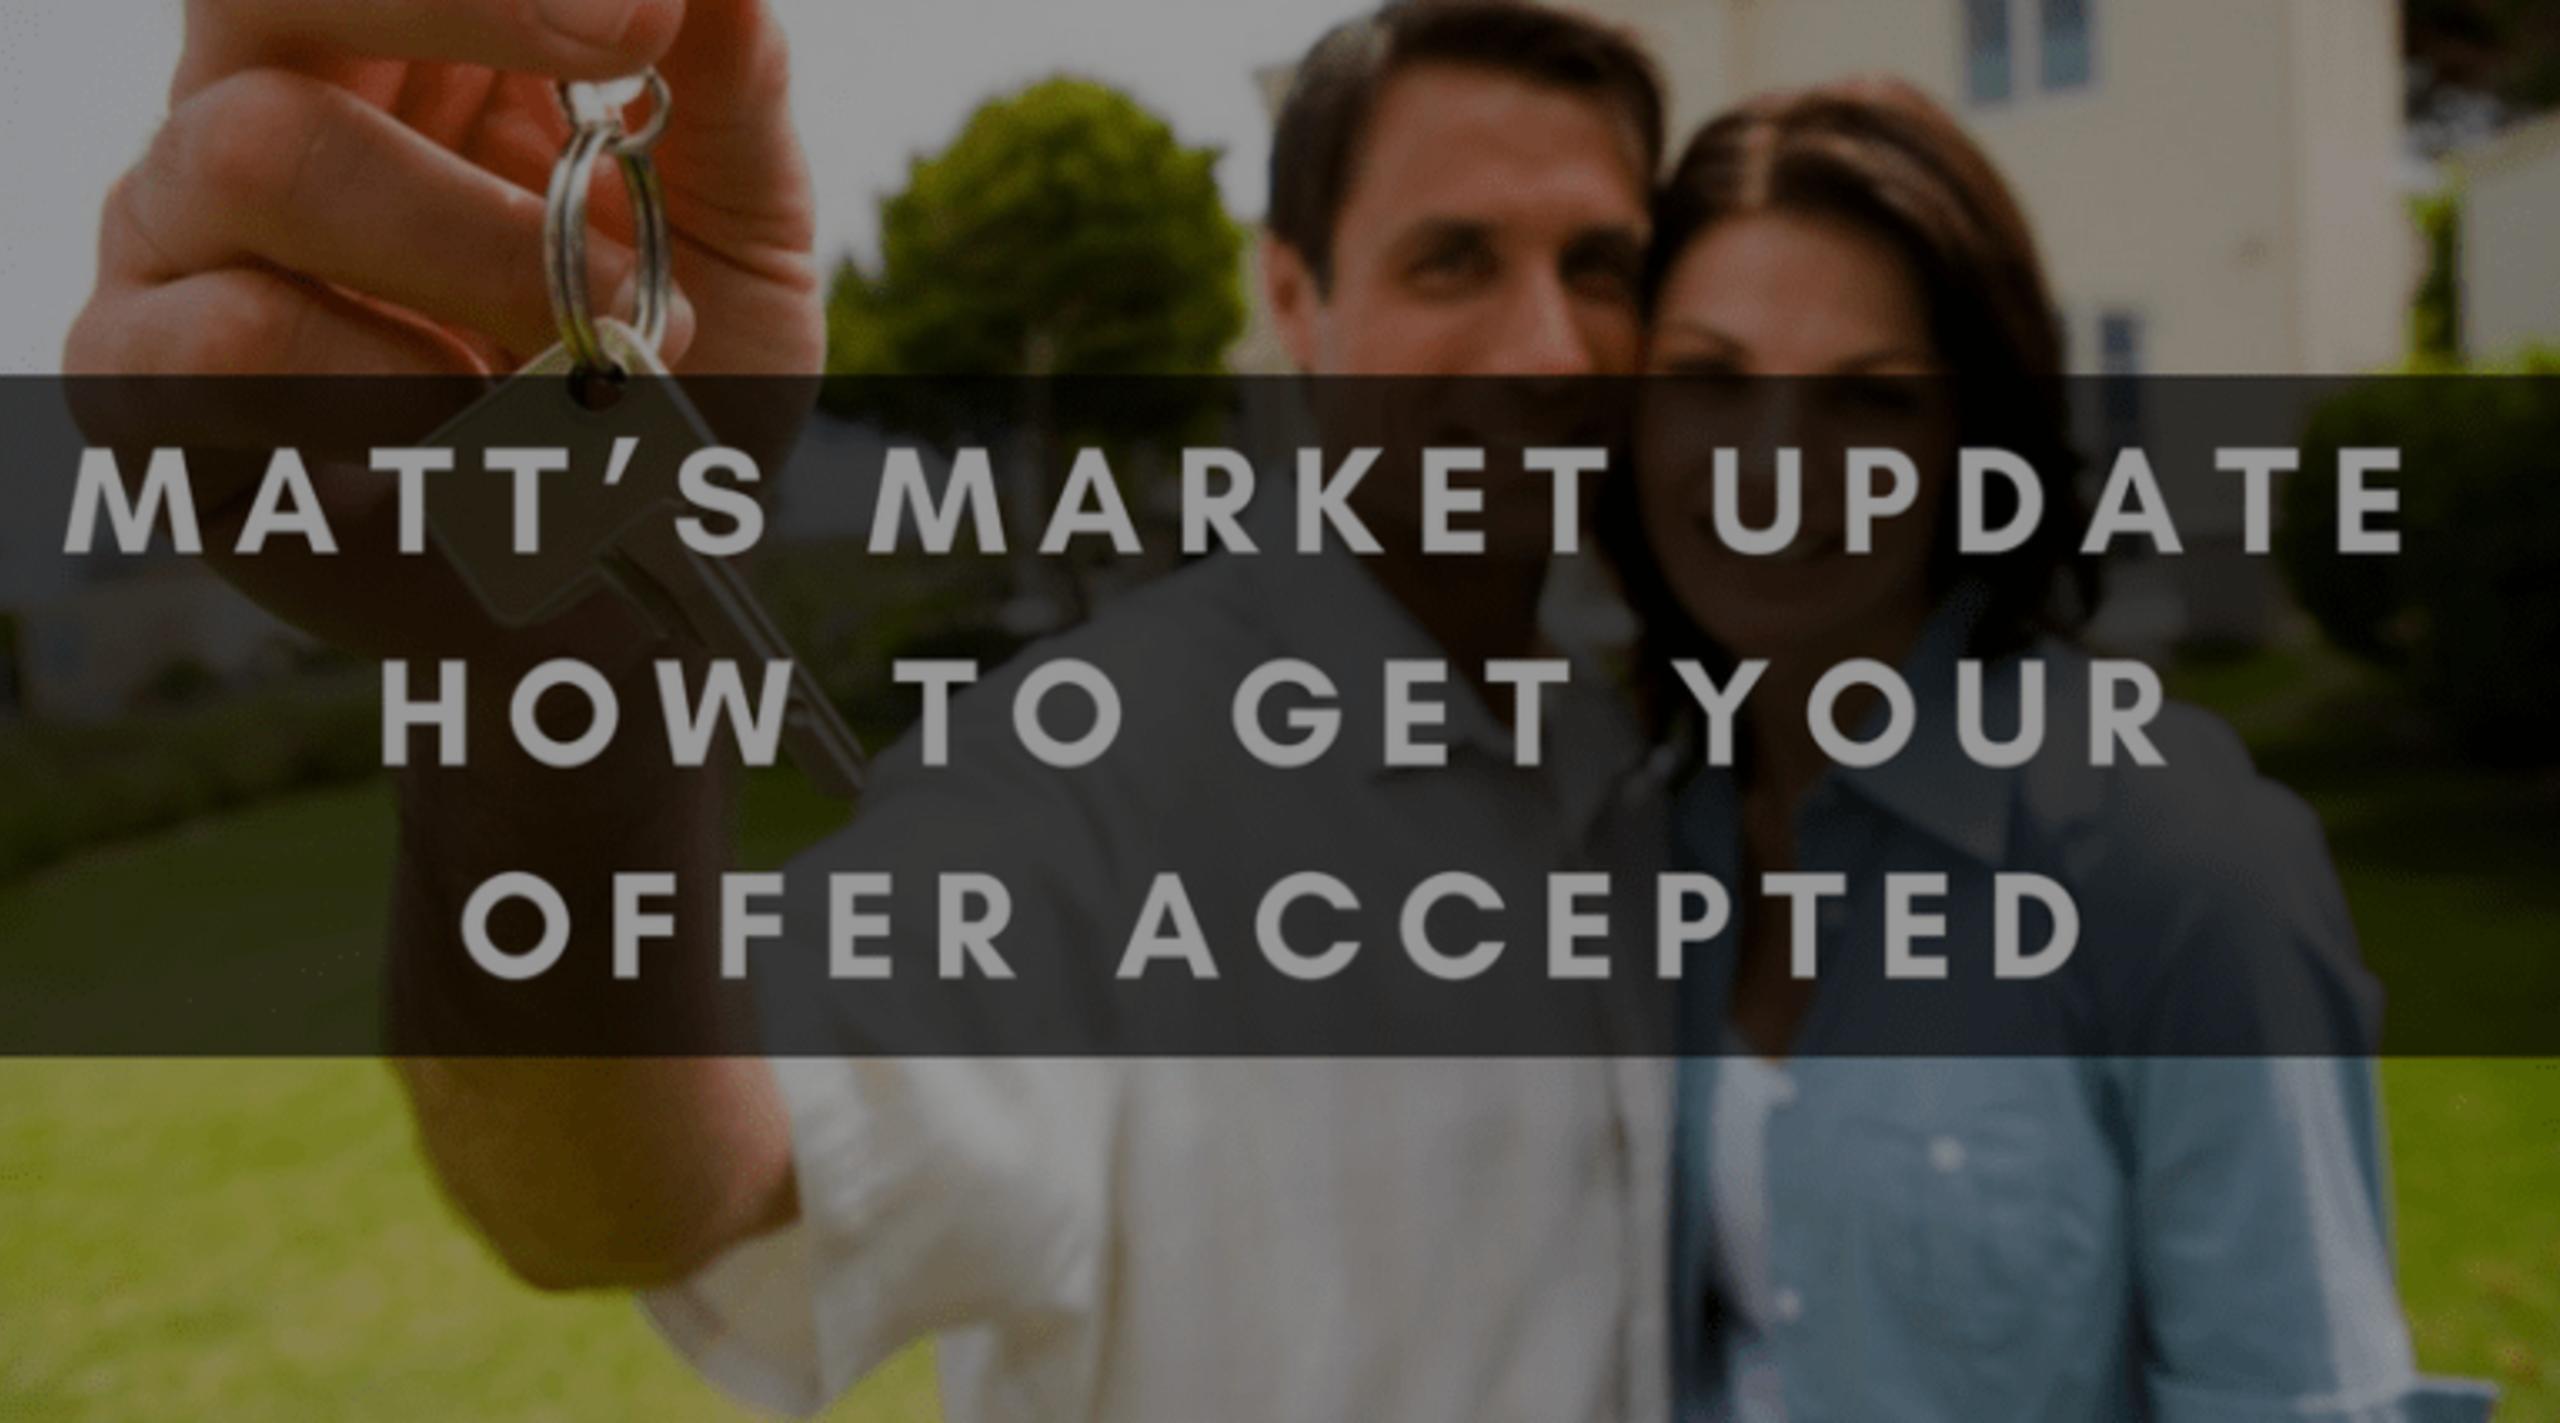 MATT'S MARKET UPDATE | HOW TO GET YOUR OFFER ACCEPTED